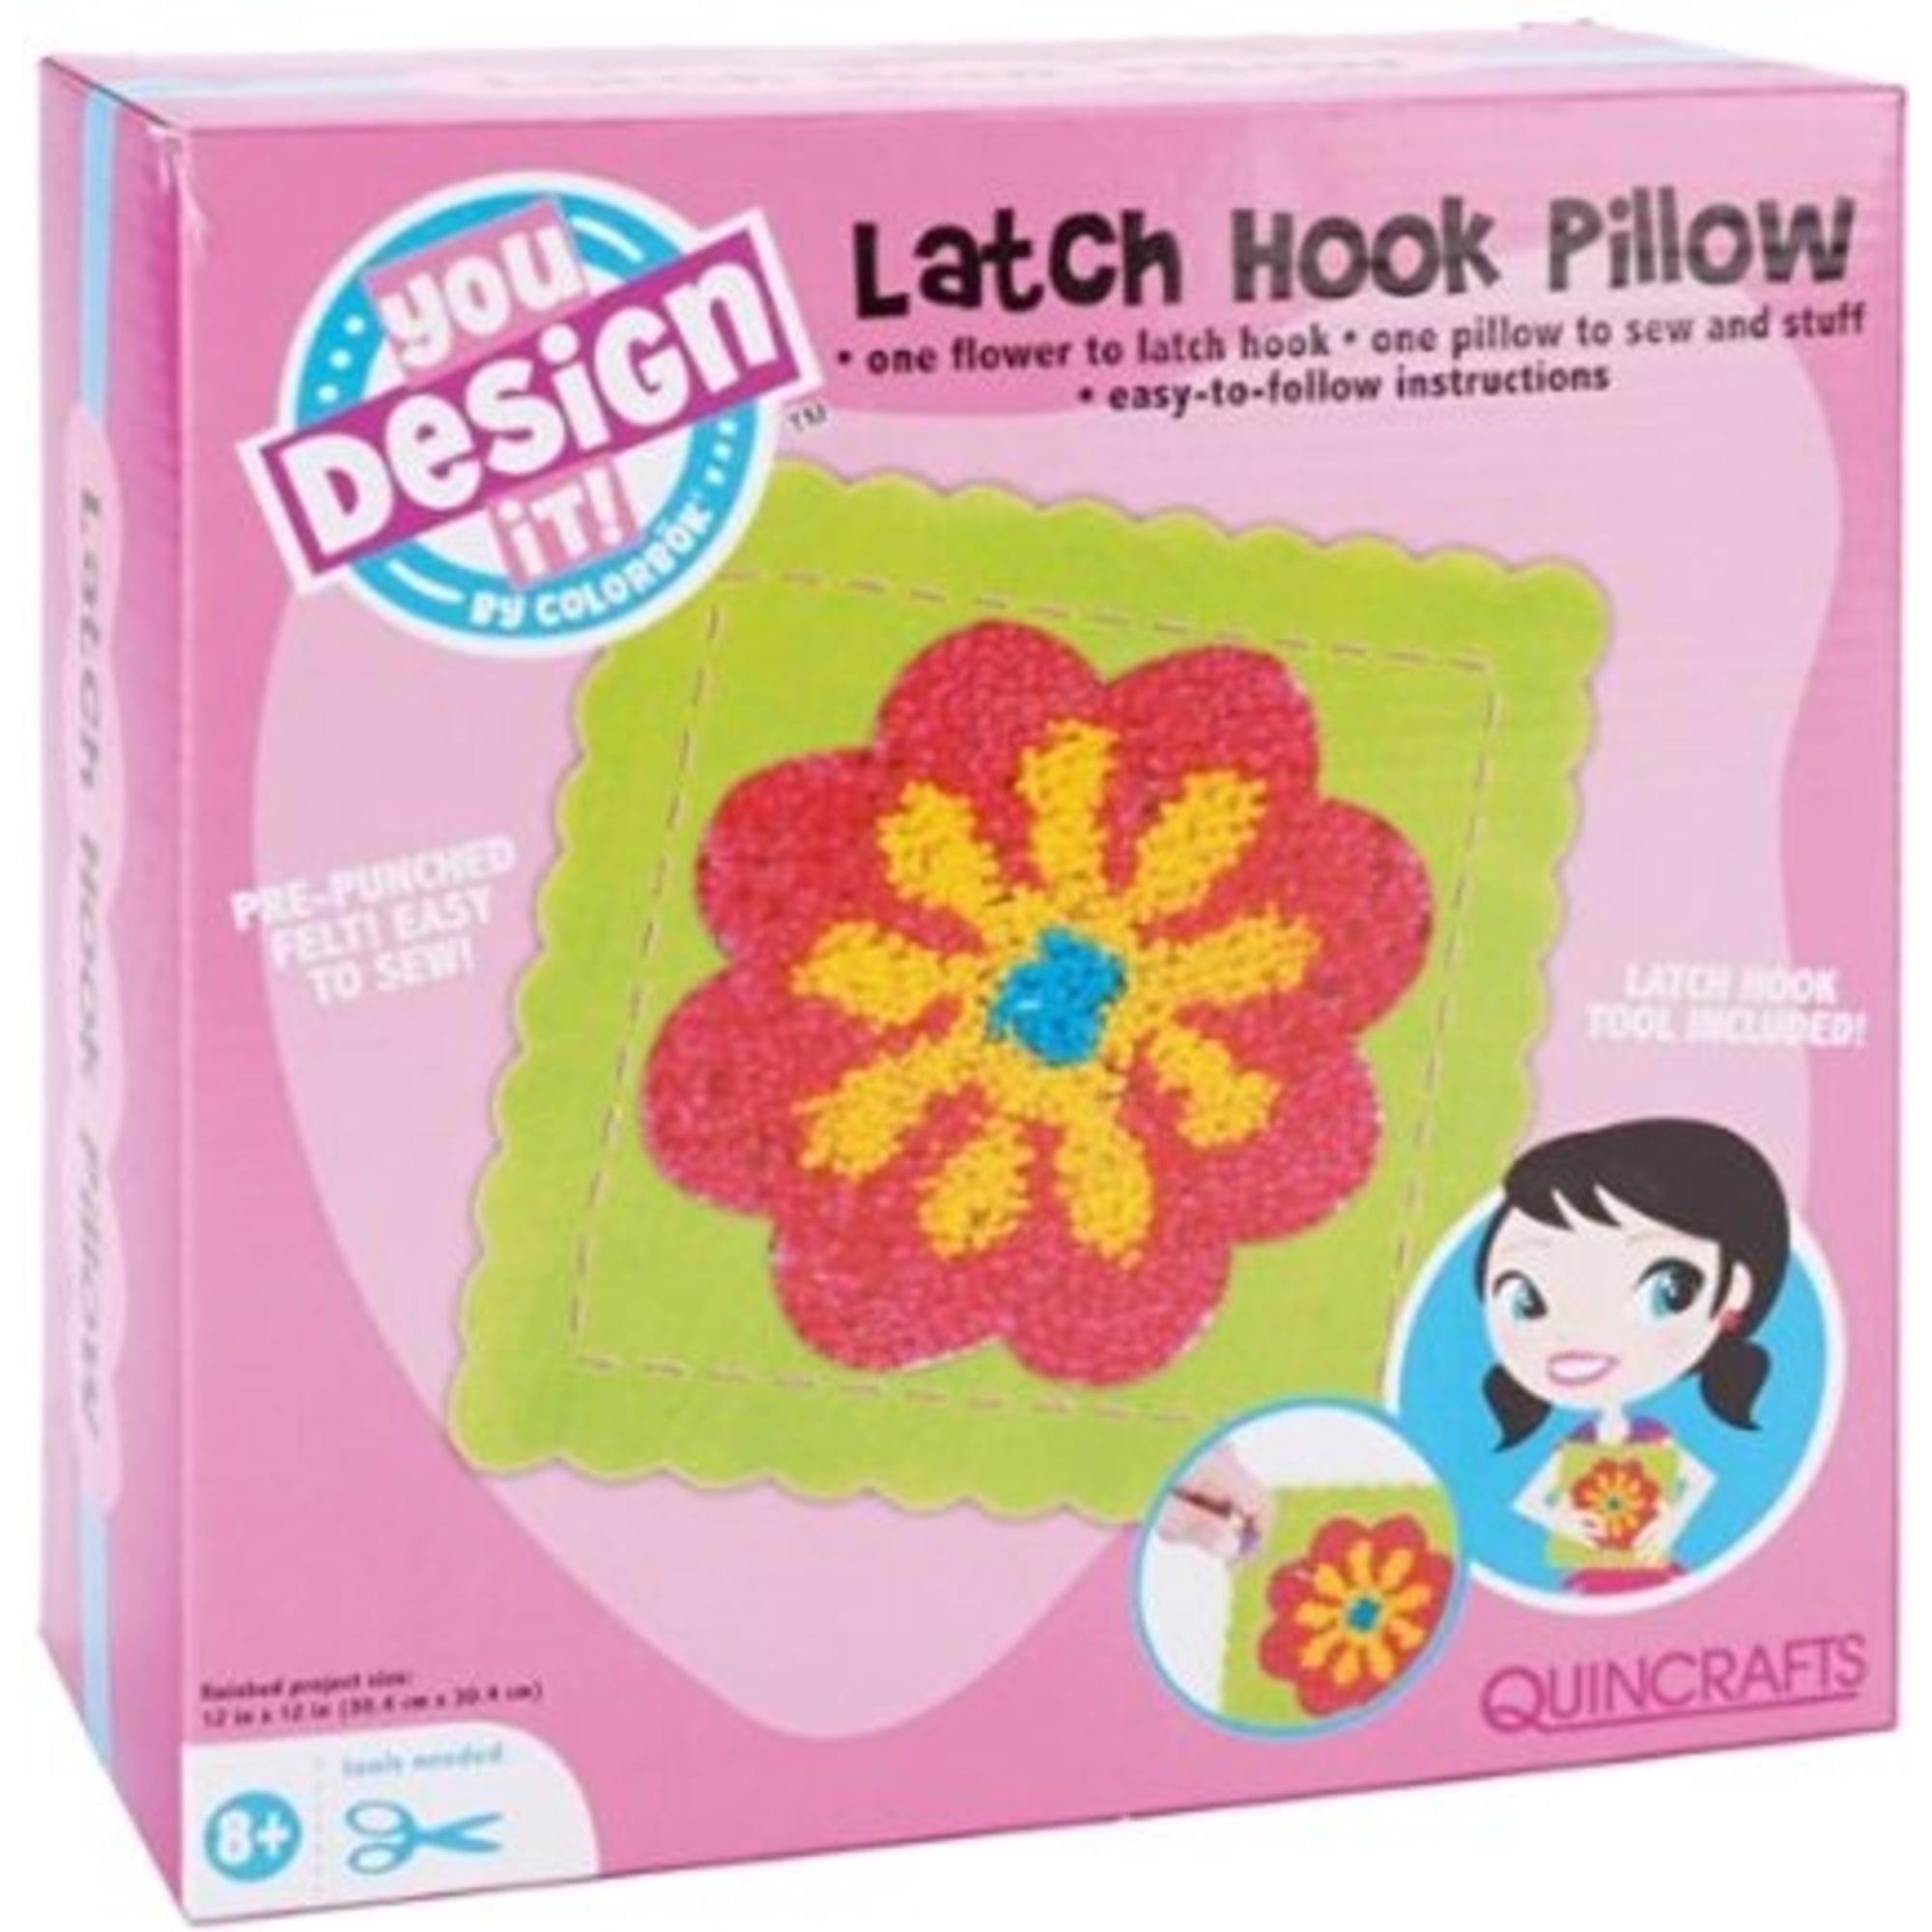 Colorbok Latch Hook Pillow Kit - Flower Design